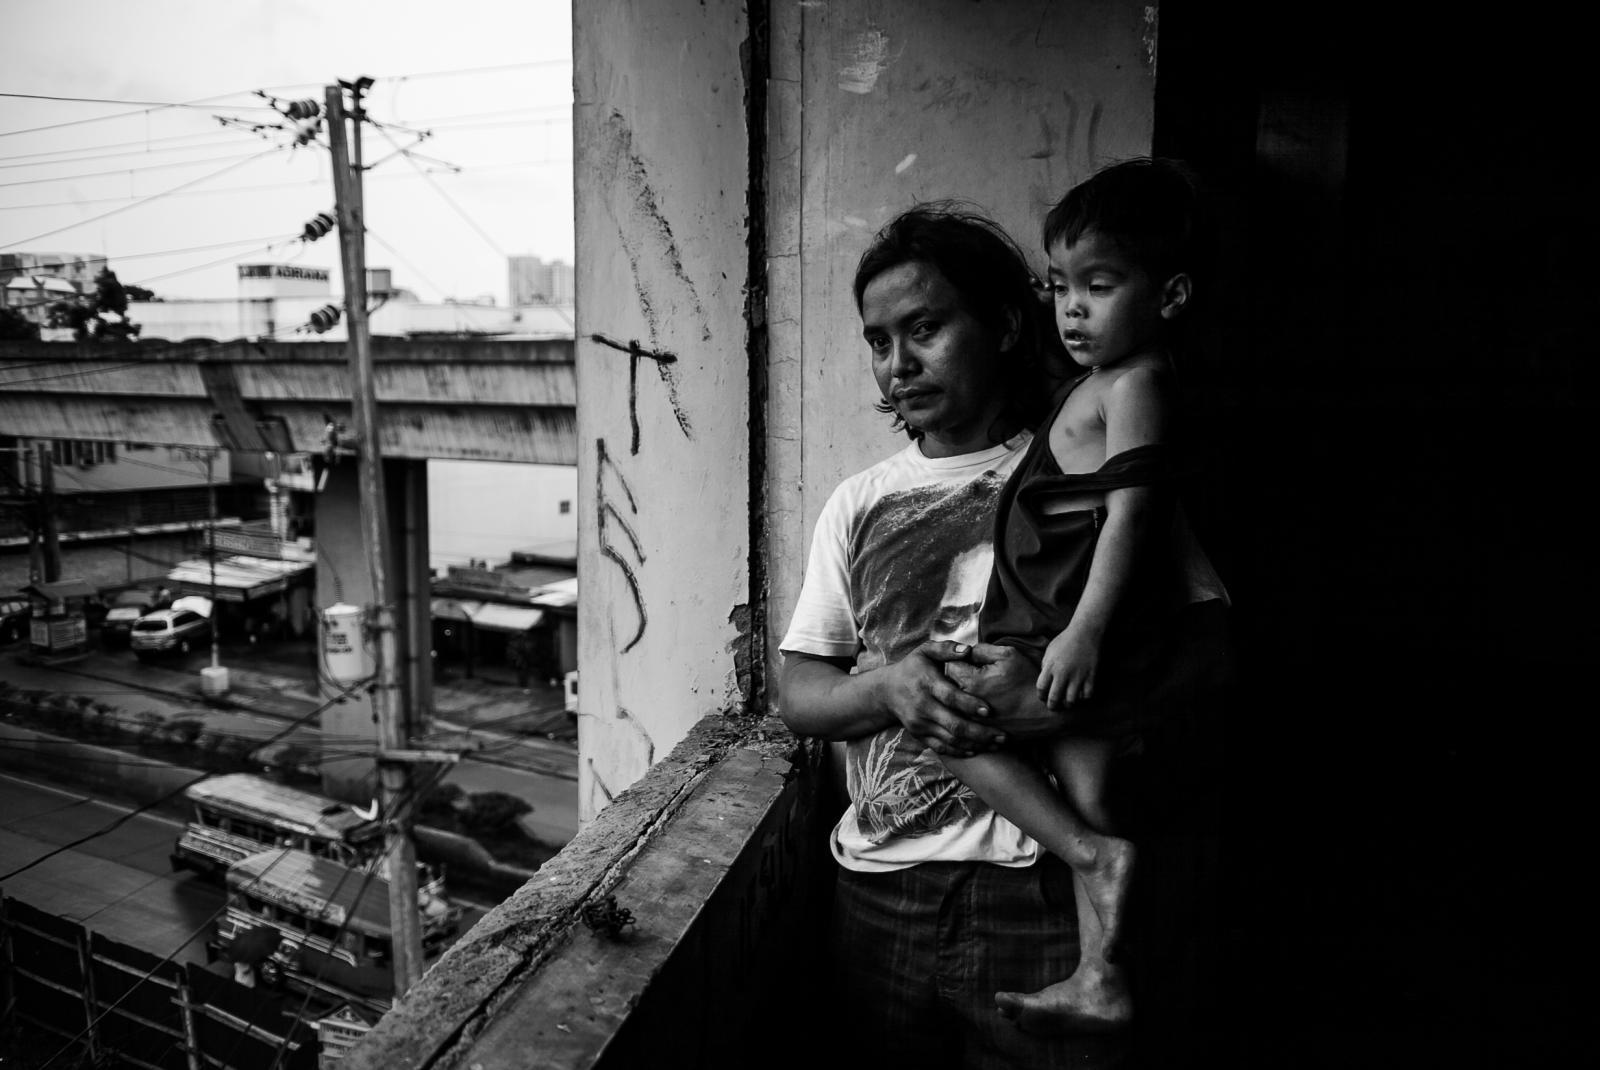 Photography image - Loading 2-11-12Poverty_In_Manila4439.JPG